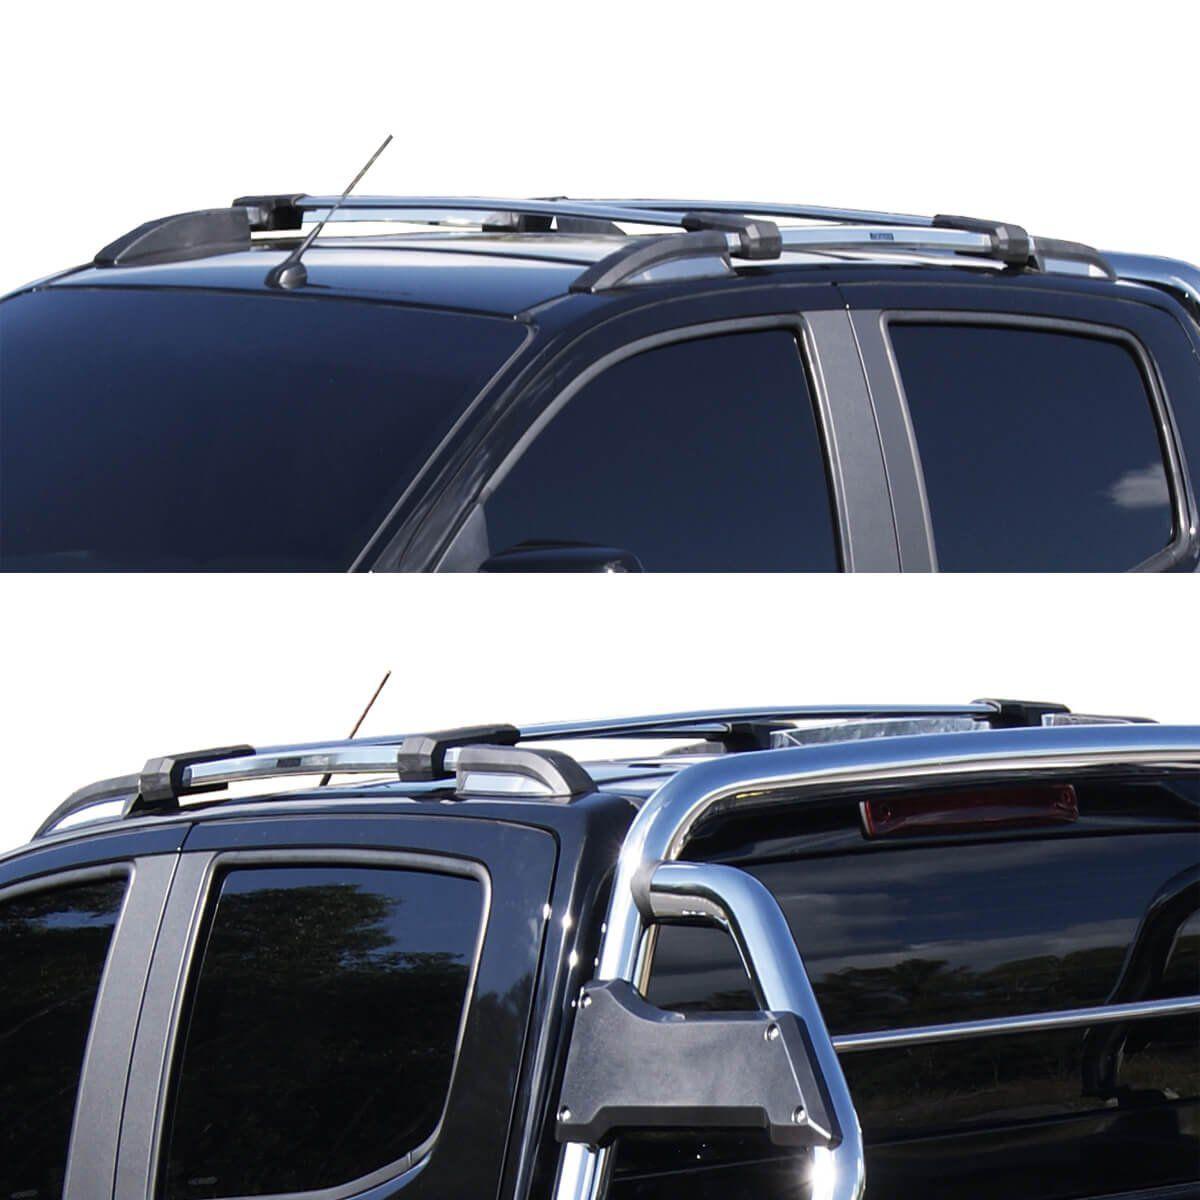 Longarina de teto Bepo Elite polido Nova S10 cabine dupla 2012 a 2021